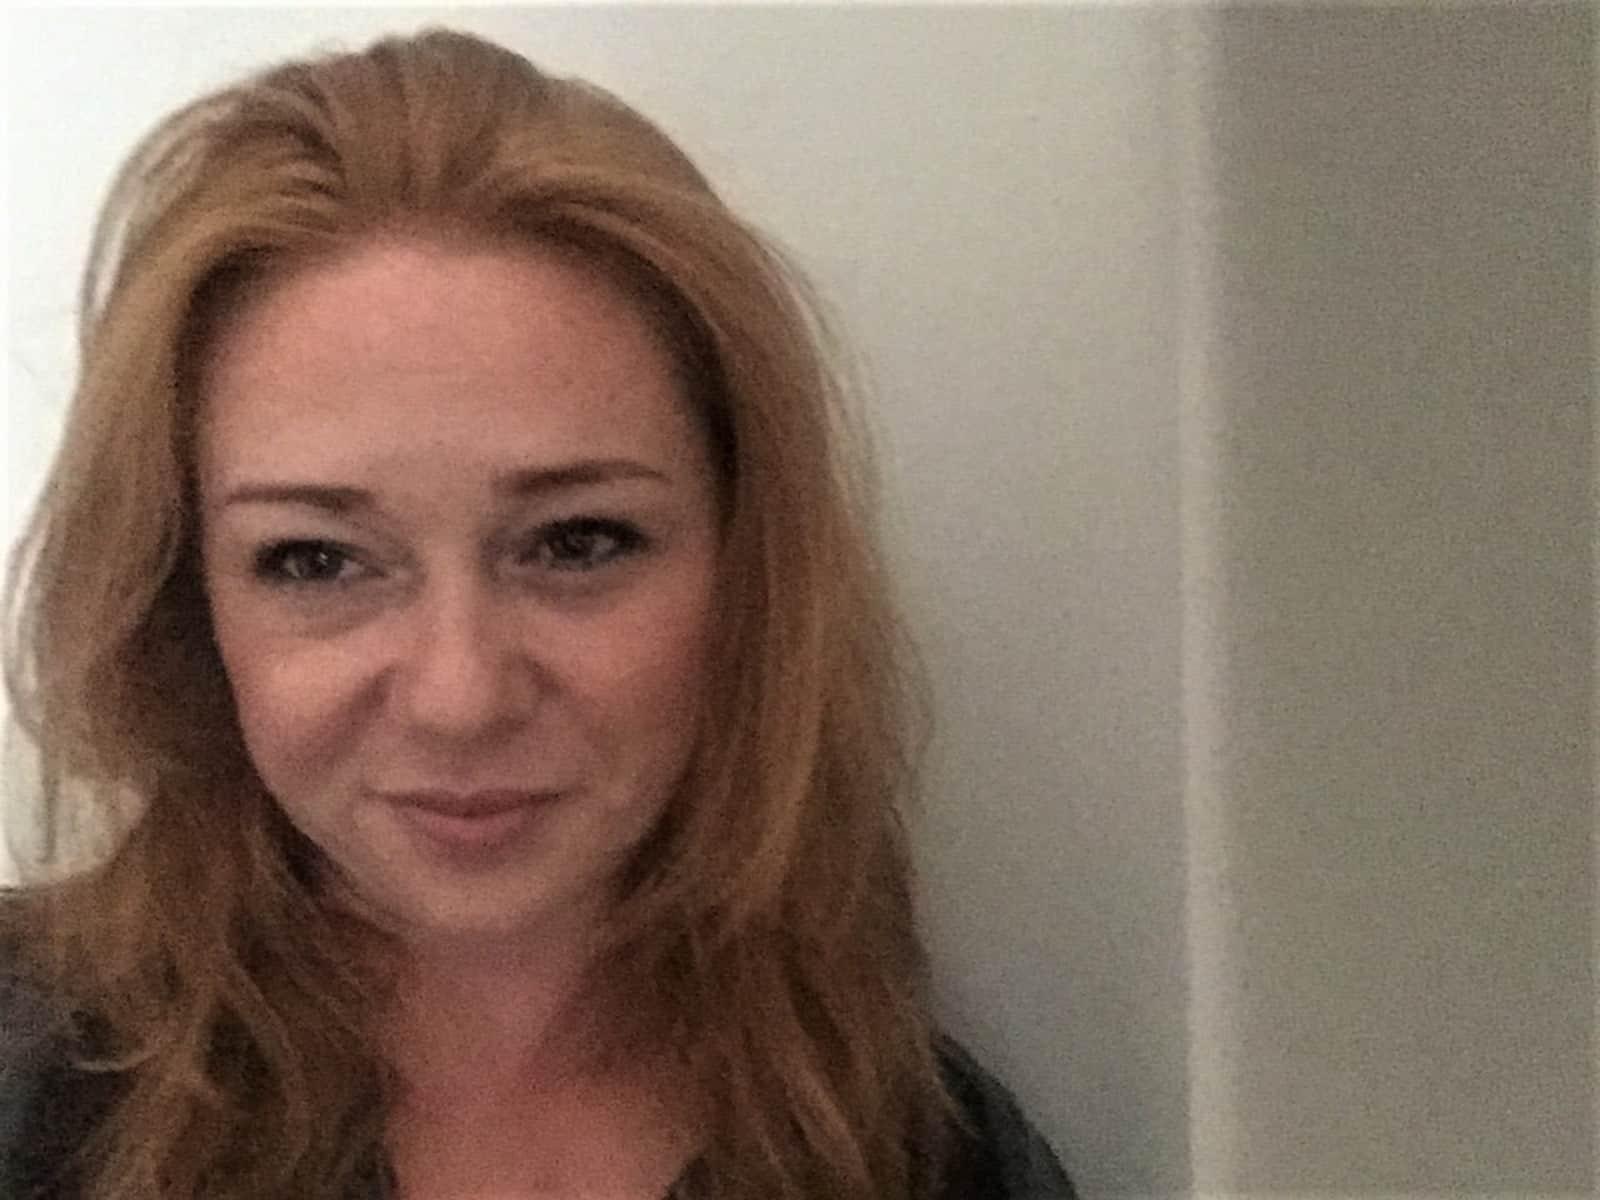 Charlotte from Royal Tunbridge Wells, United Kingdom